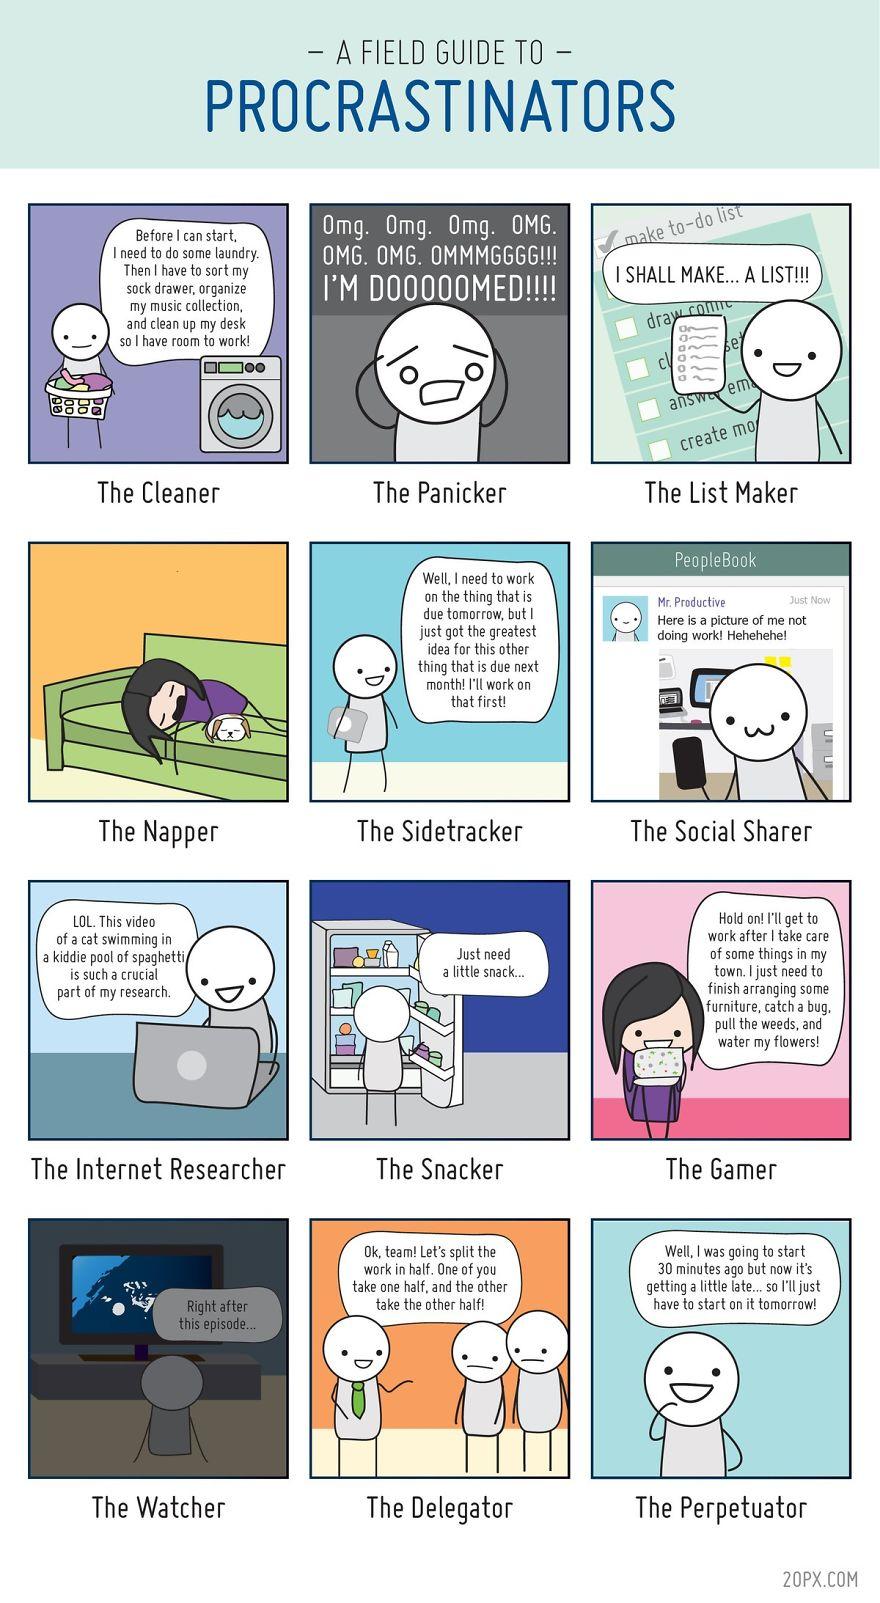 12 Ways To Procrastinate